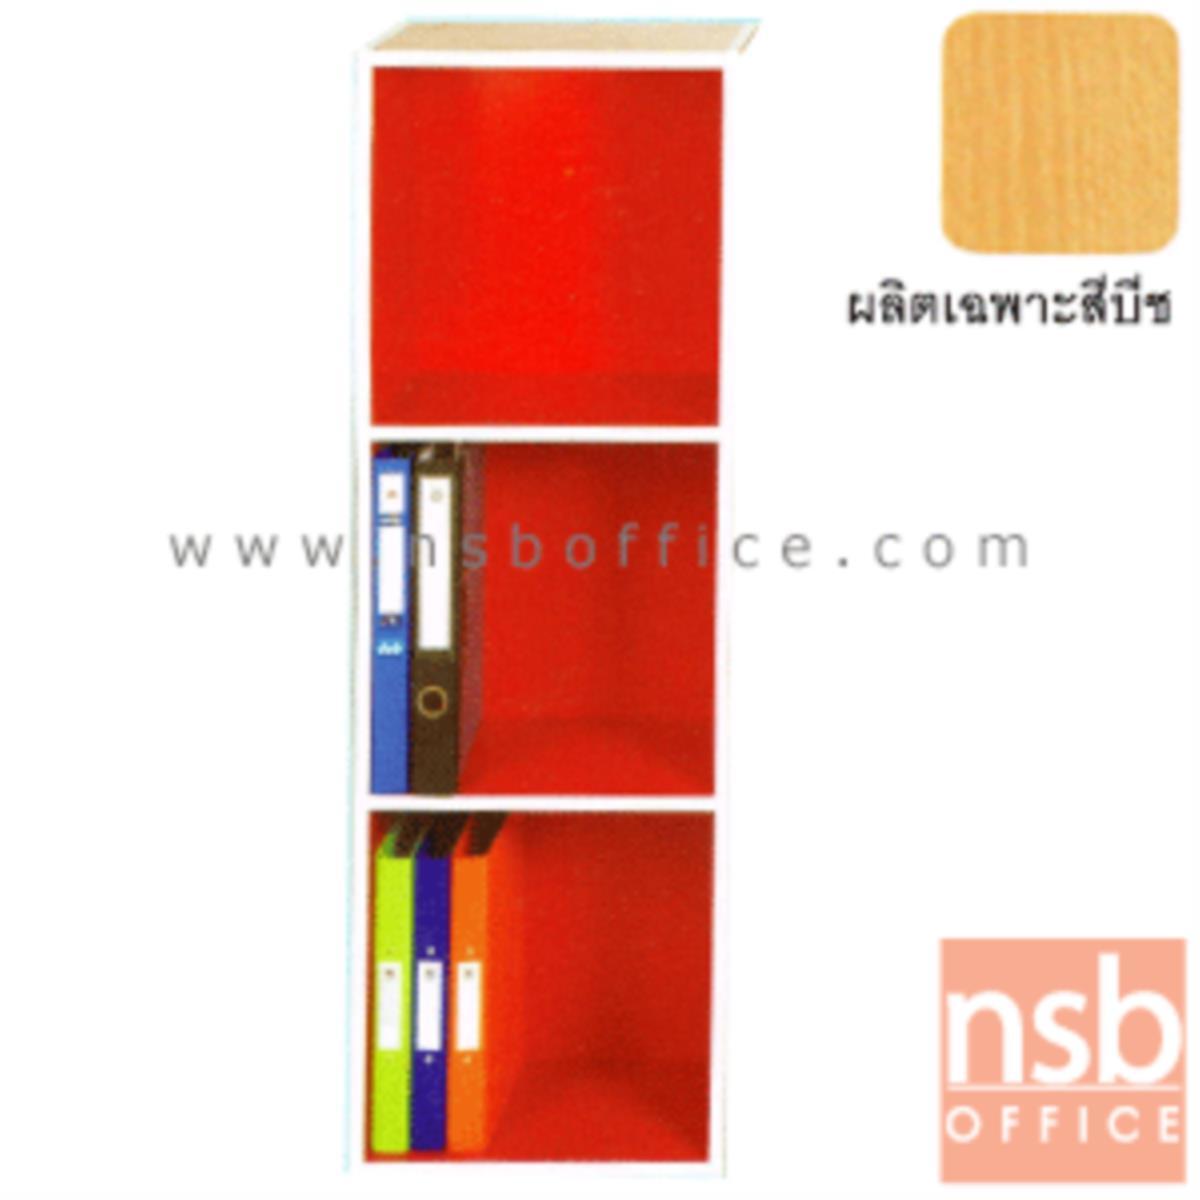 E08A044:ตู้ไม้คอนโด 3 ชั้นโล่ง รุ่น NMM-XL381 ขนาด 29.5W*117H cm. สีบีชล้วน